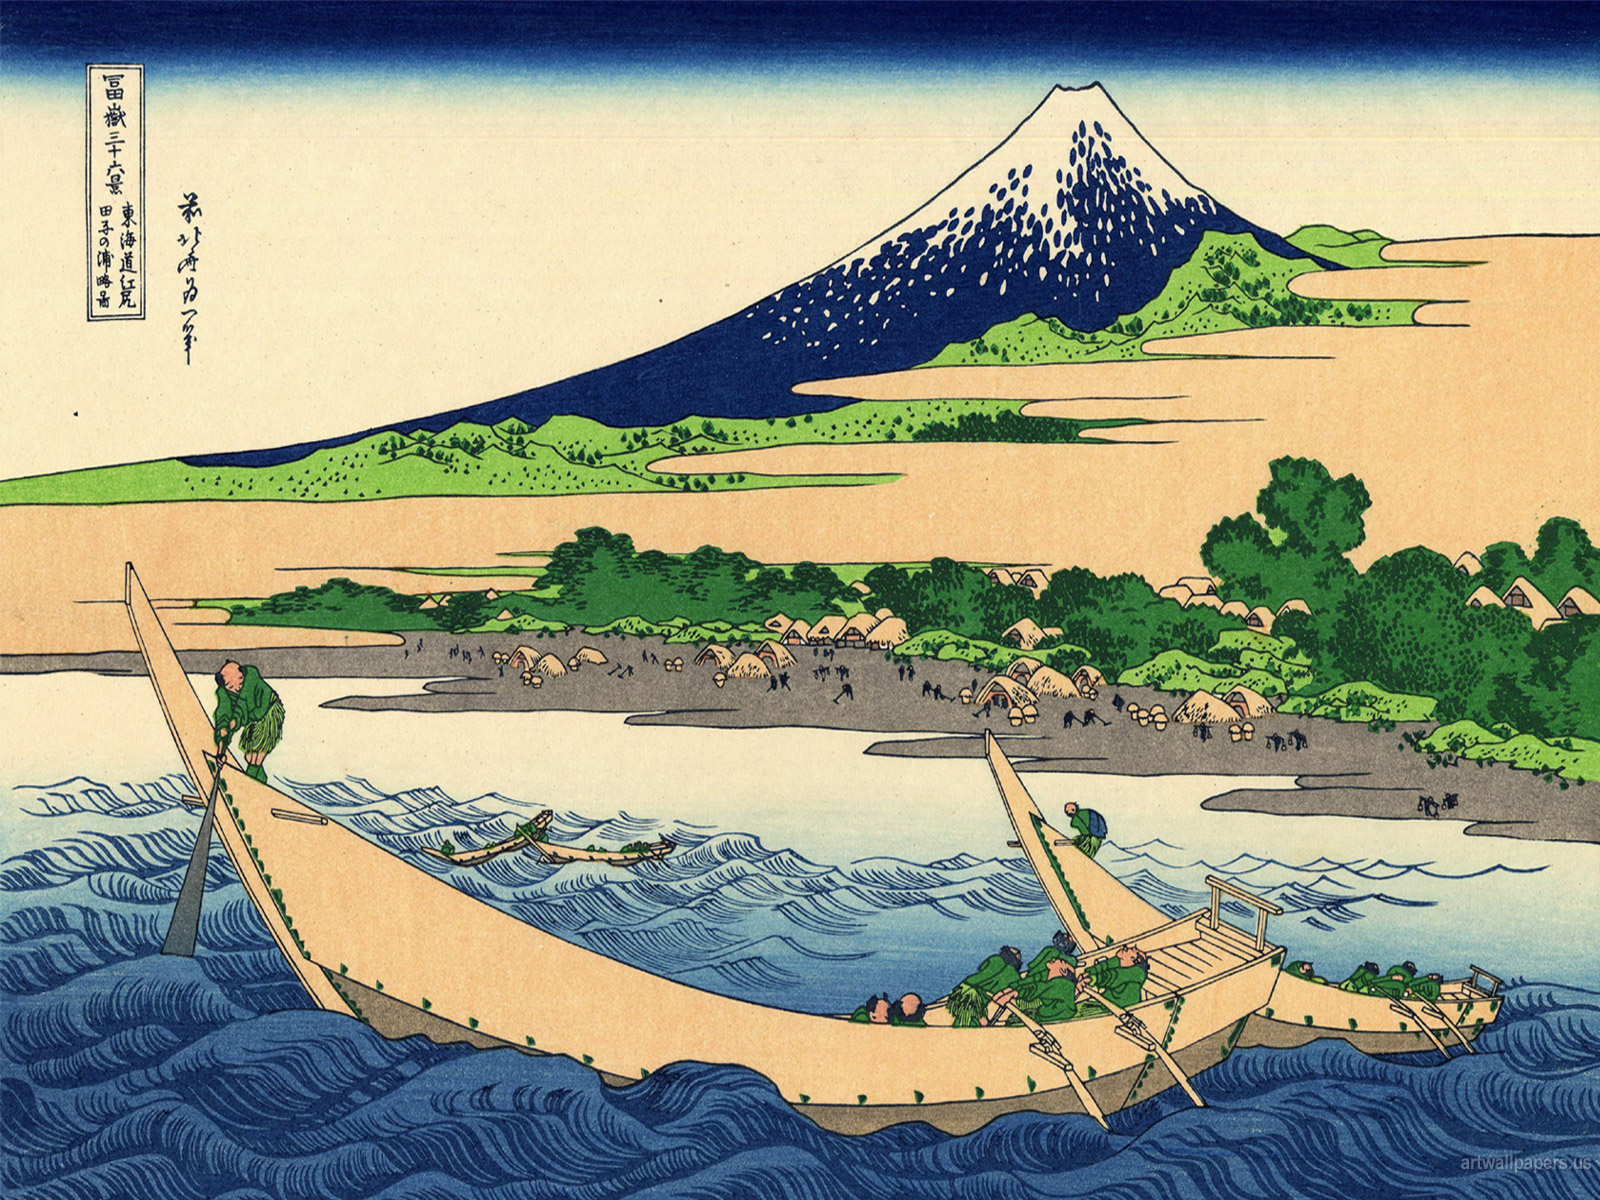 Hokusai Wallpaper The Great Wave at Kanagawa Art Print Wallpapers 1600x1200